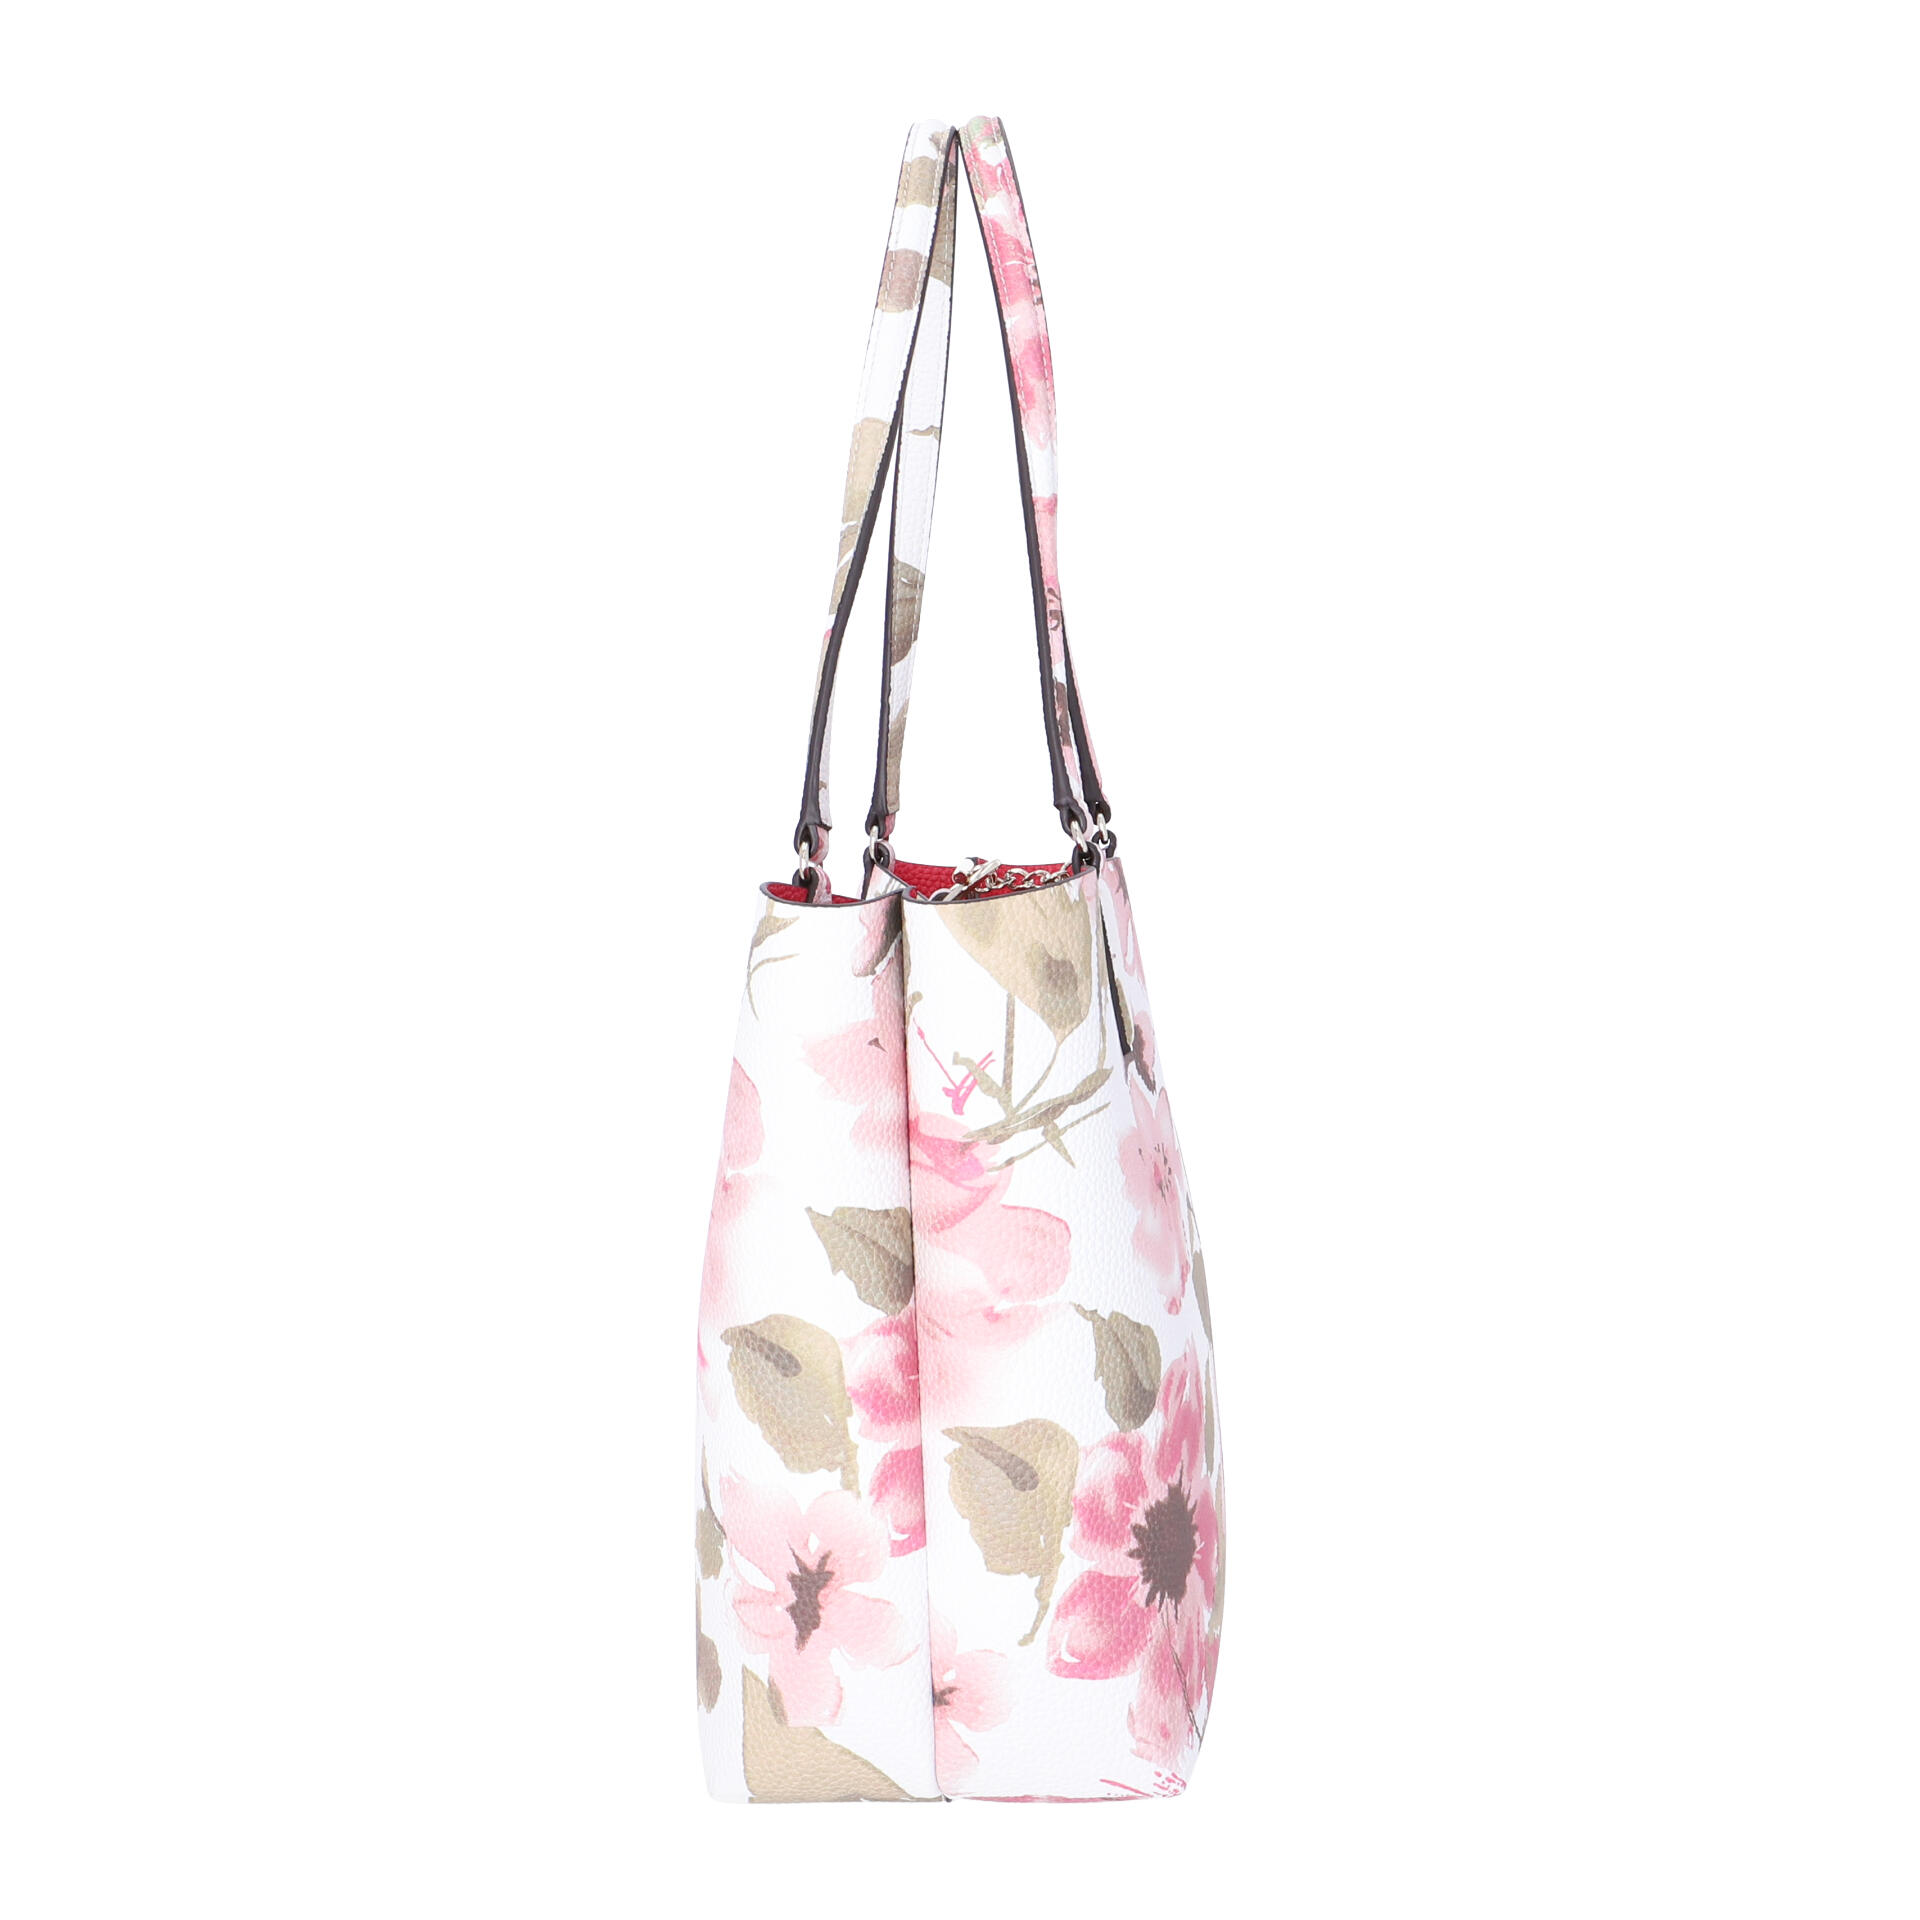 Alby Shopper mit herausnehmbarer Pochette spring floral